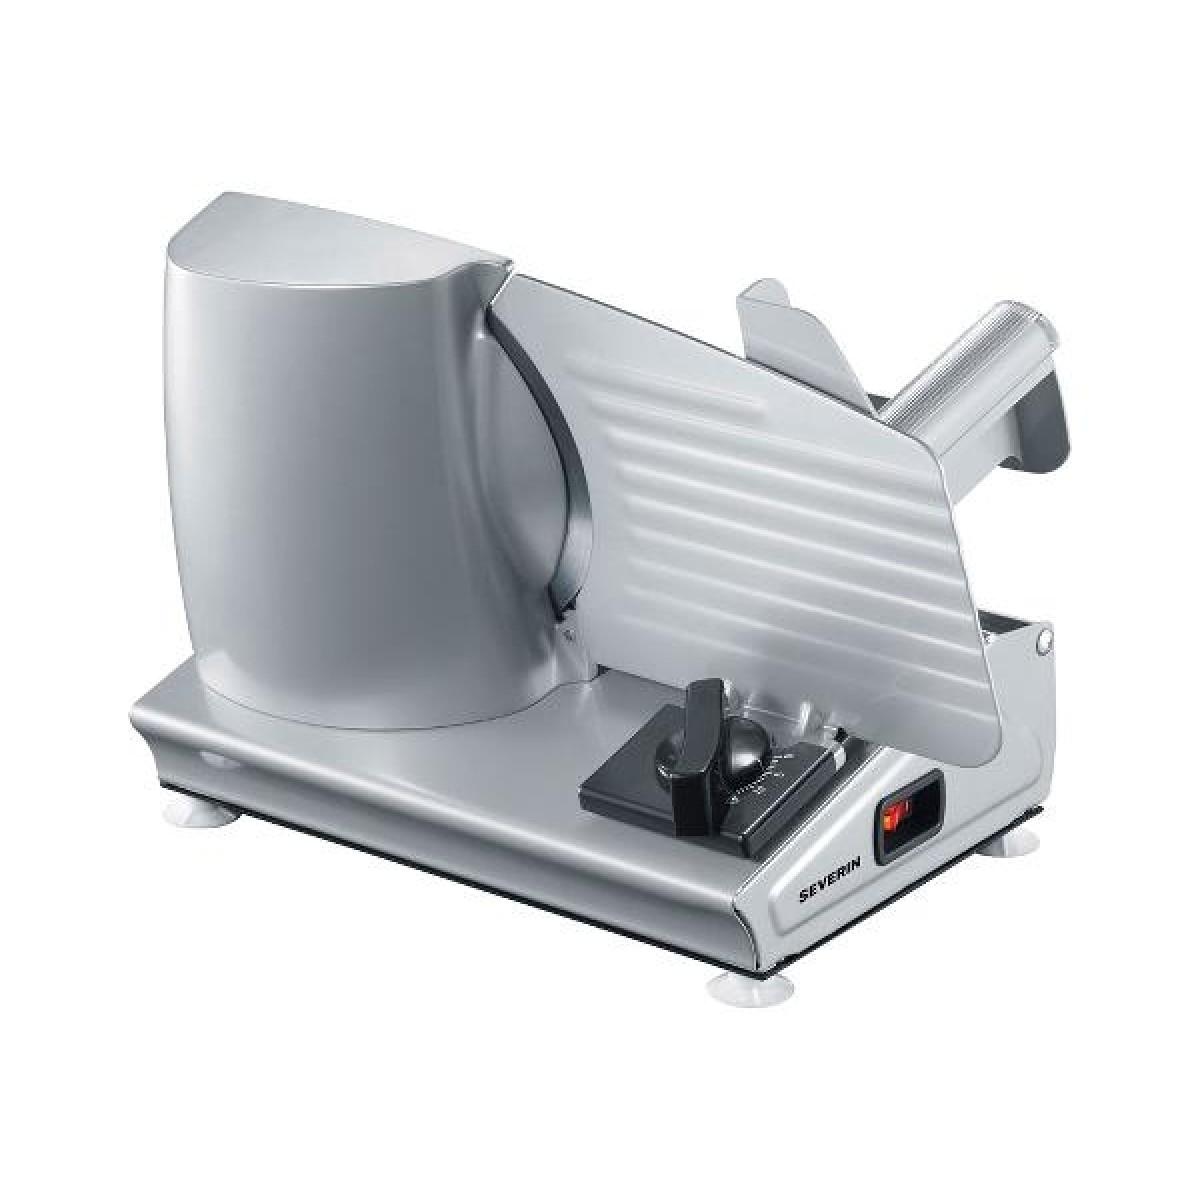 SEVERIN Pålægsmaskine 2 knive 180 watt